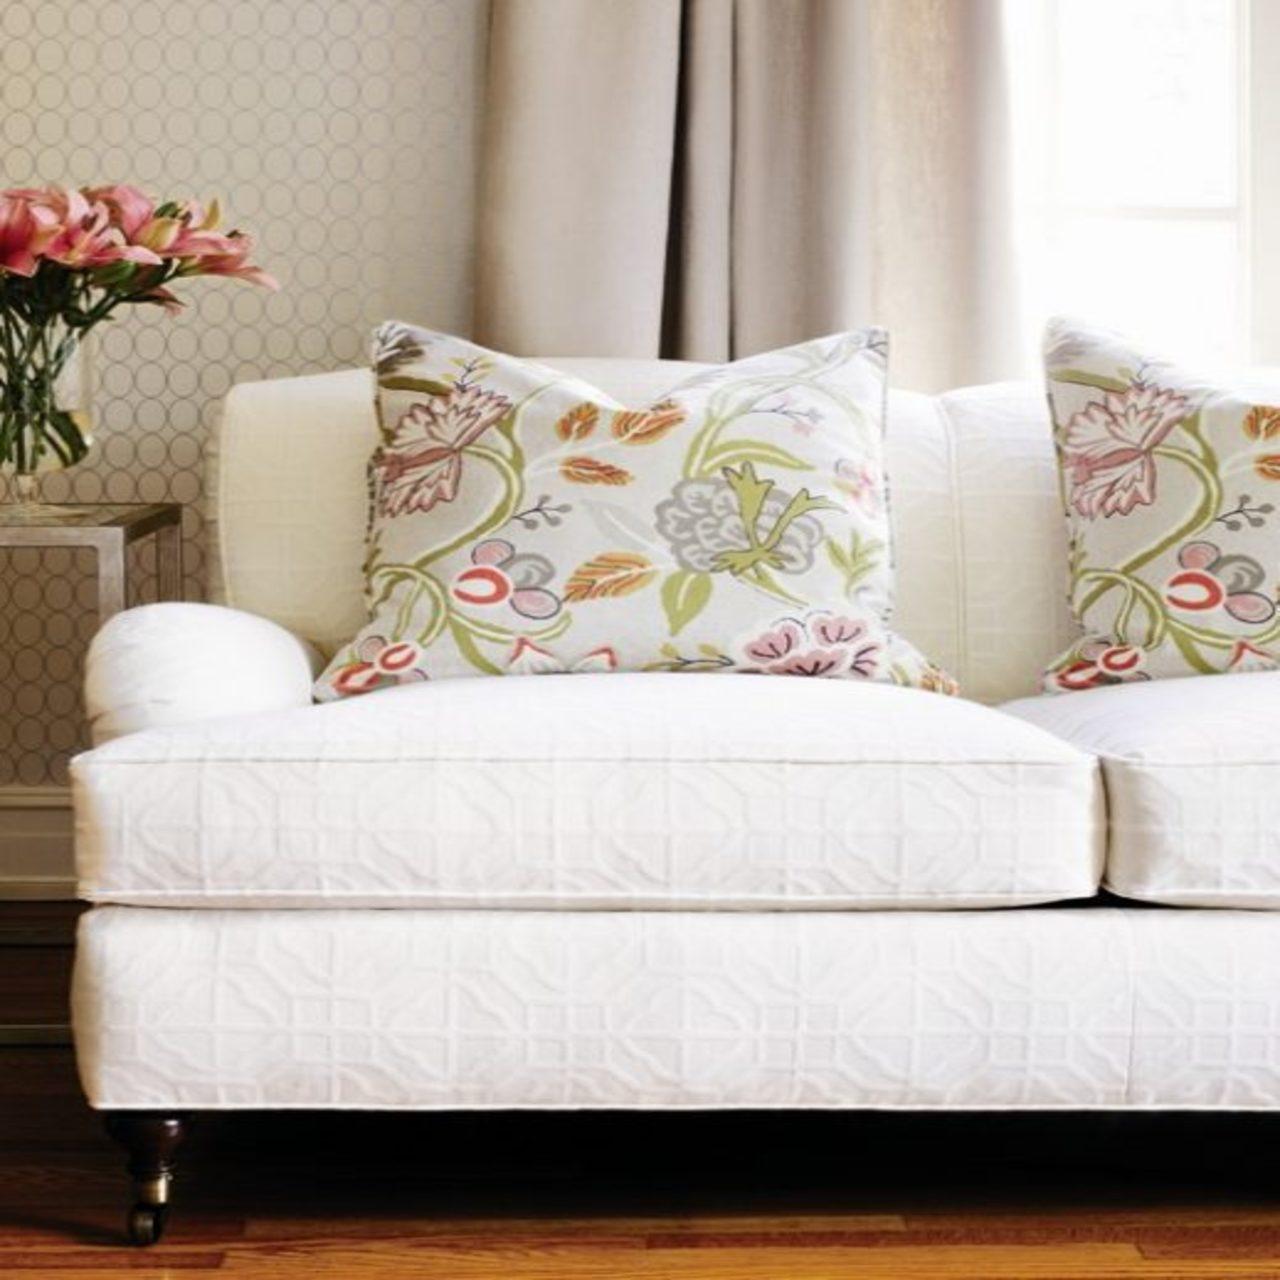 Sofa Upholstery Dubai | 100% Quality Upholstery Services UAE